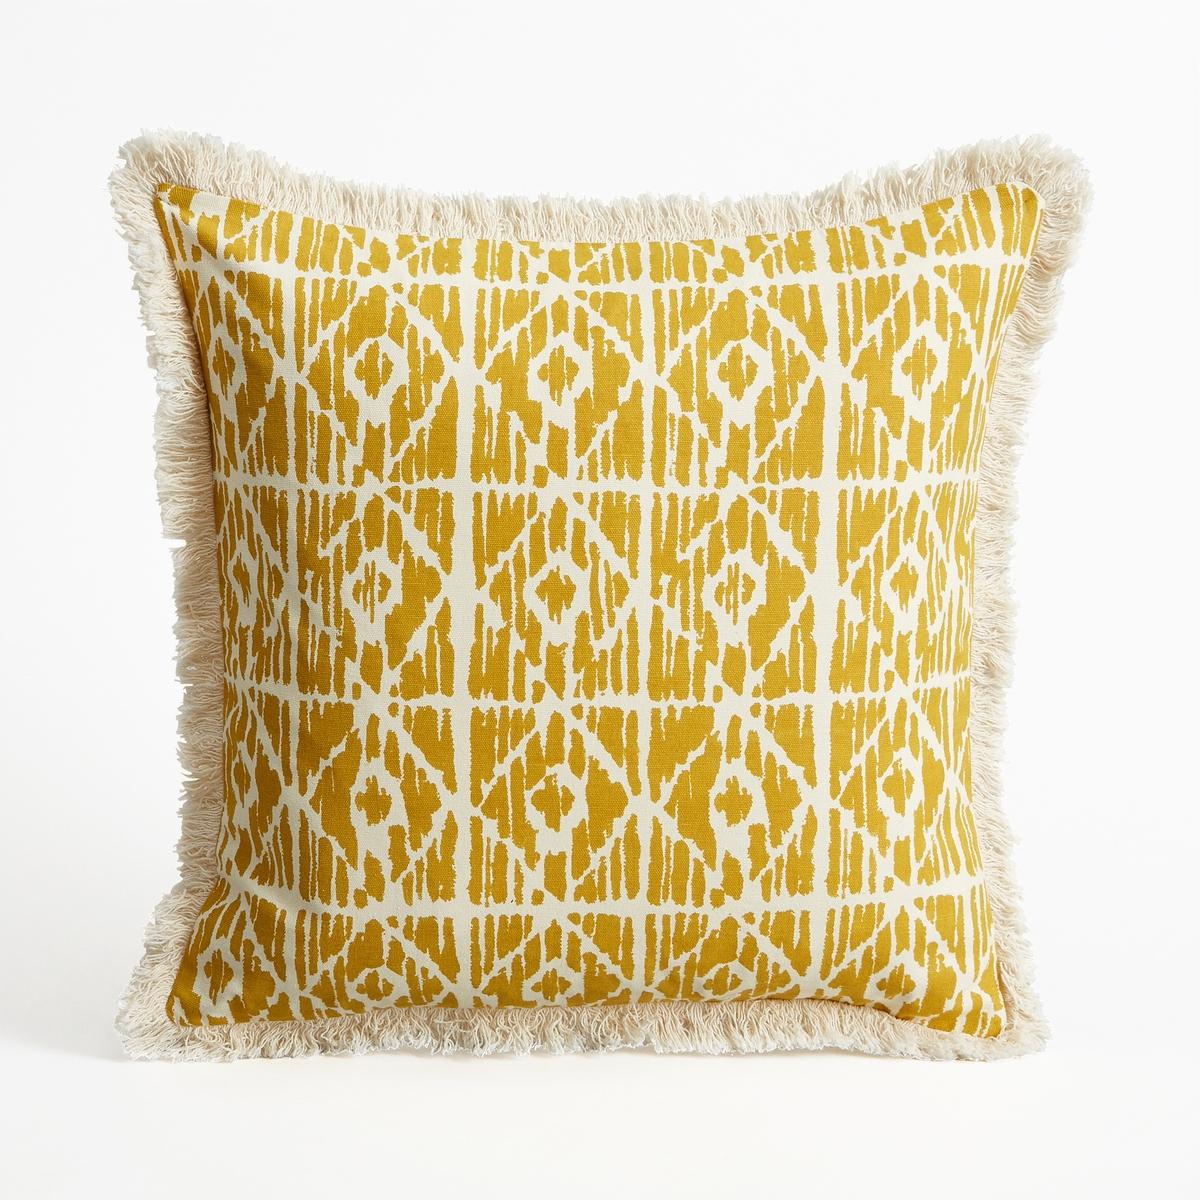 Наволочка на подушку-валик Nizonne<br><br>Цвет: оливковый